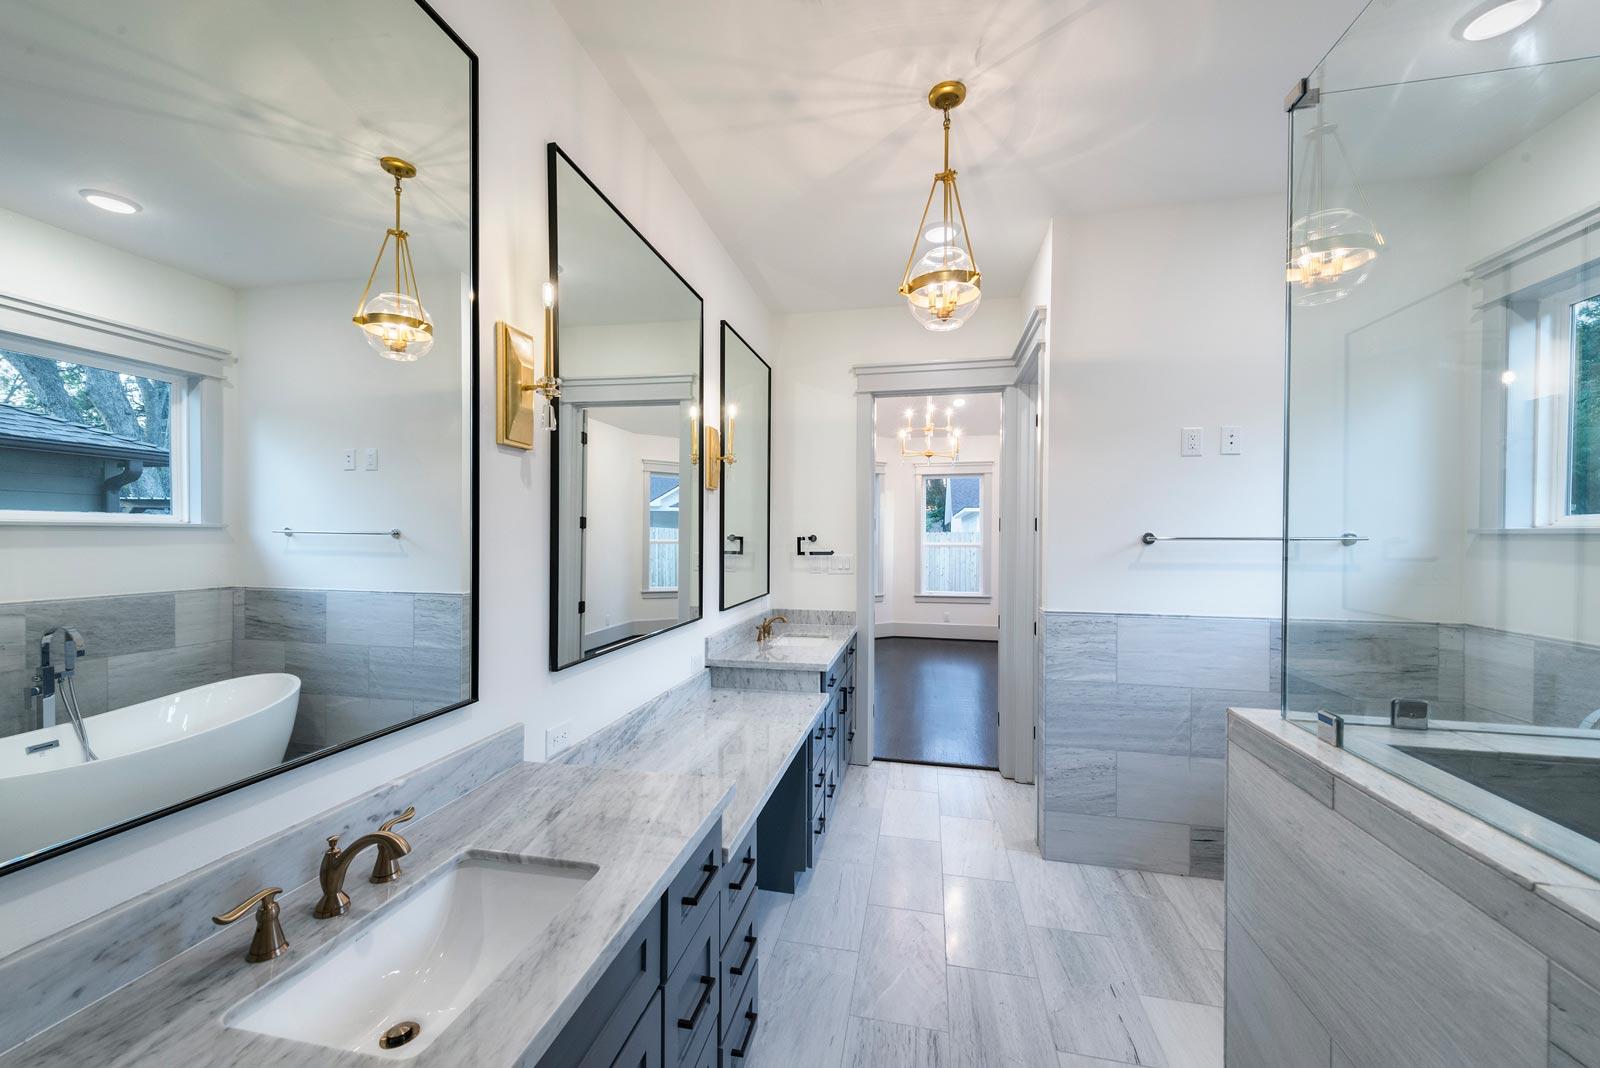 Houston-Homebuilder-Custom-Homebuilder-Central-Houston-Homebuilder-Oak-Forest-Homebuilder-Carrara-Marble-Counters-Gray-Marble-Tile-Steel-Frame-Mirrors-Gold-Sconces